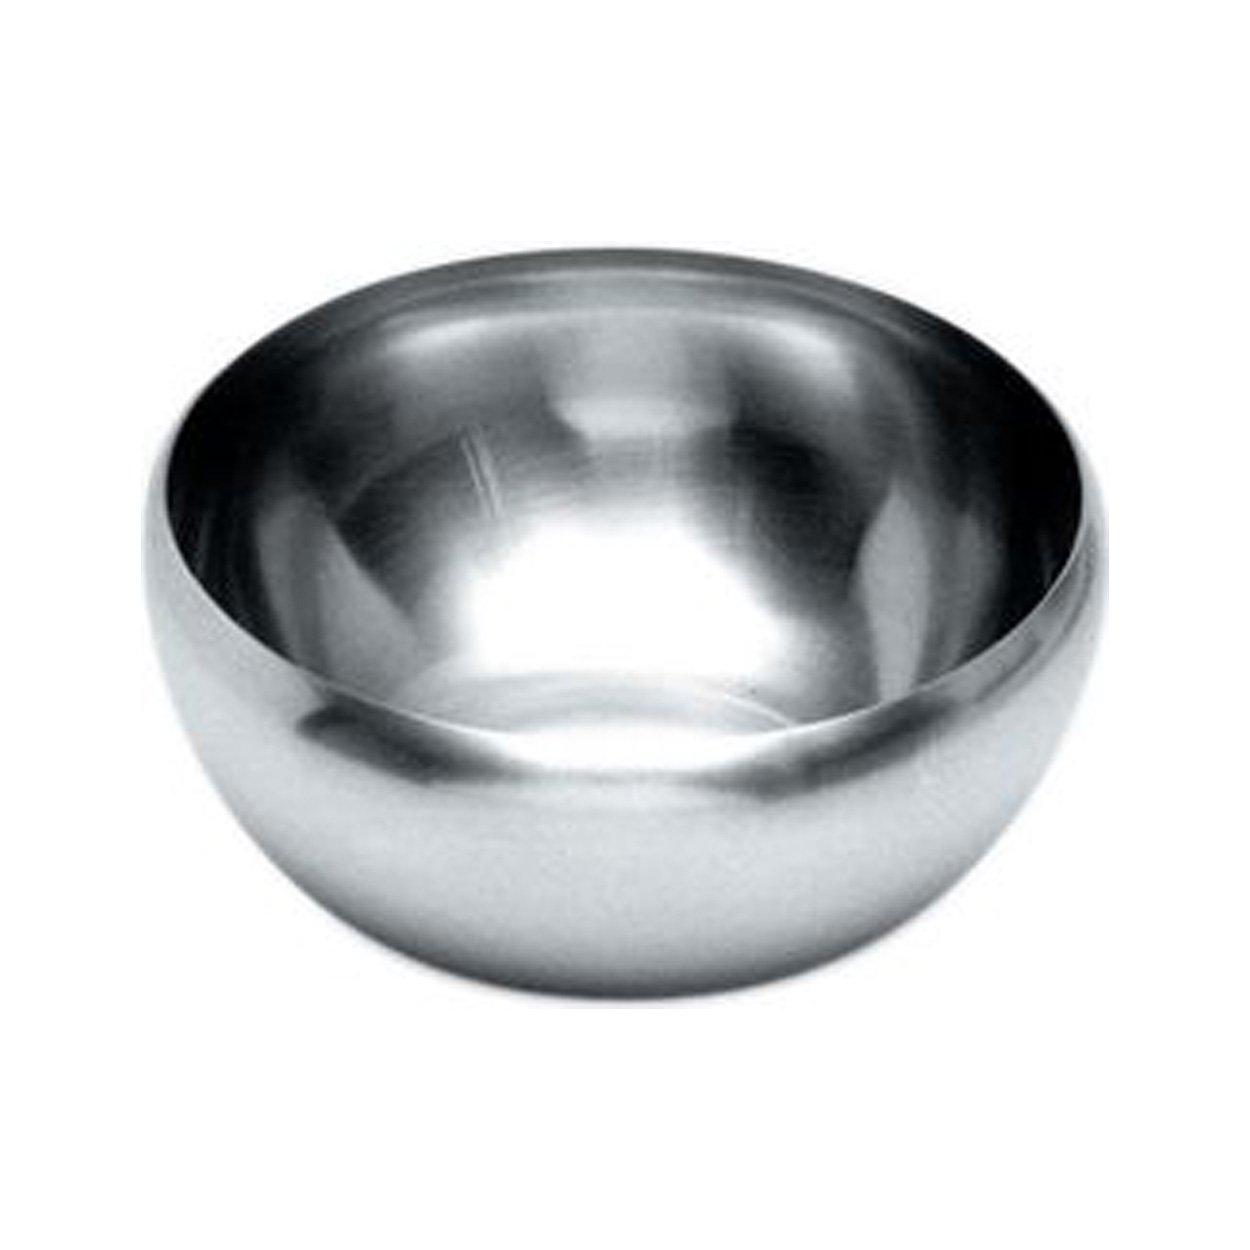 Alessi 206/12 Dessert / Salad Bowl, Stainless Steel, Set of 6